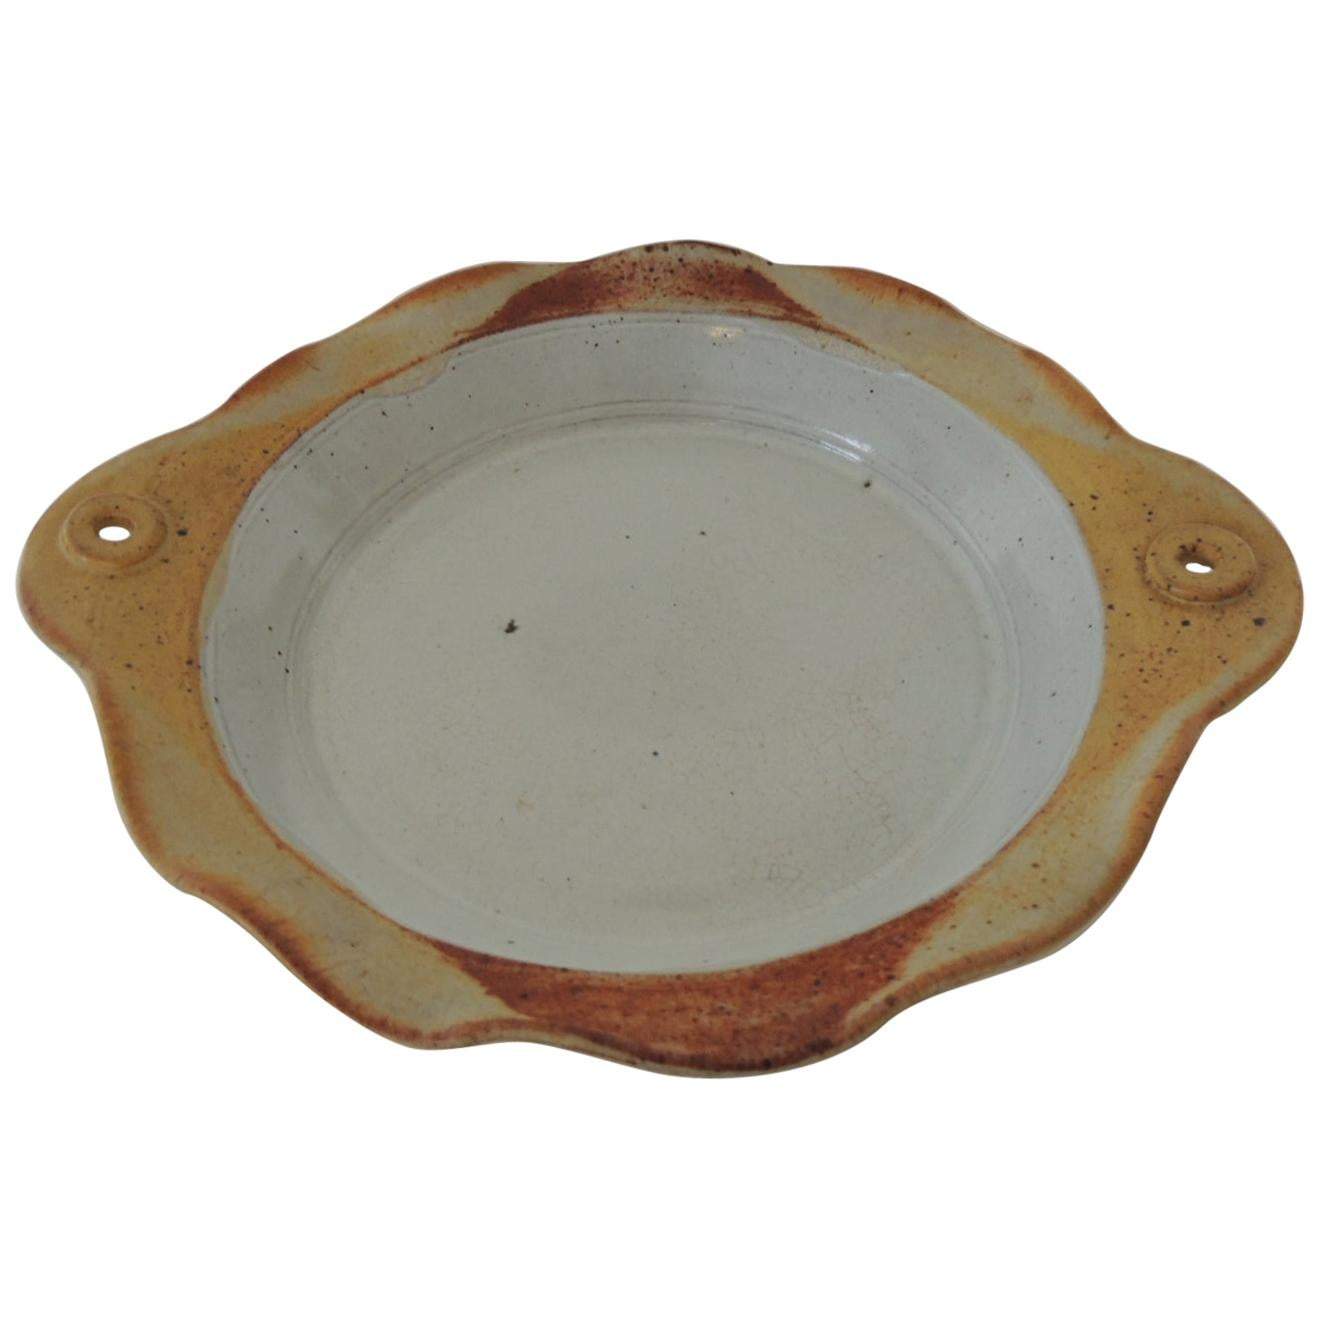 Mid-Century Modern Round Decorative Serving Bowl